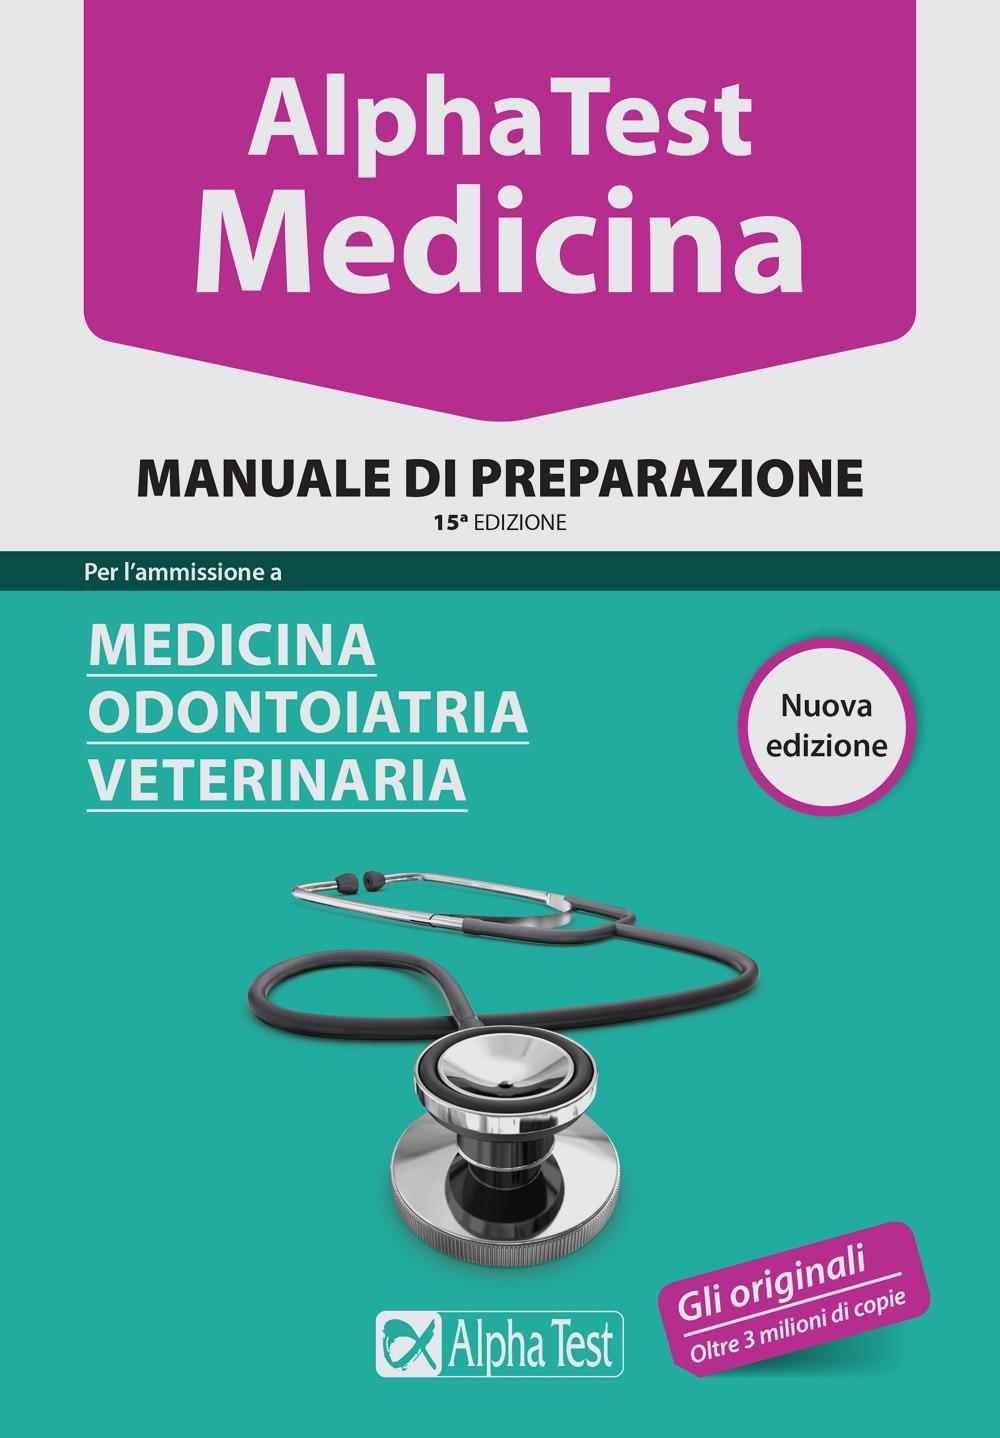 Alpha Test. Medicina, odontoiatria, veterinaria. Manuale di prepar..